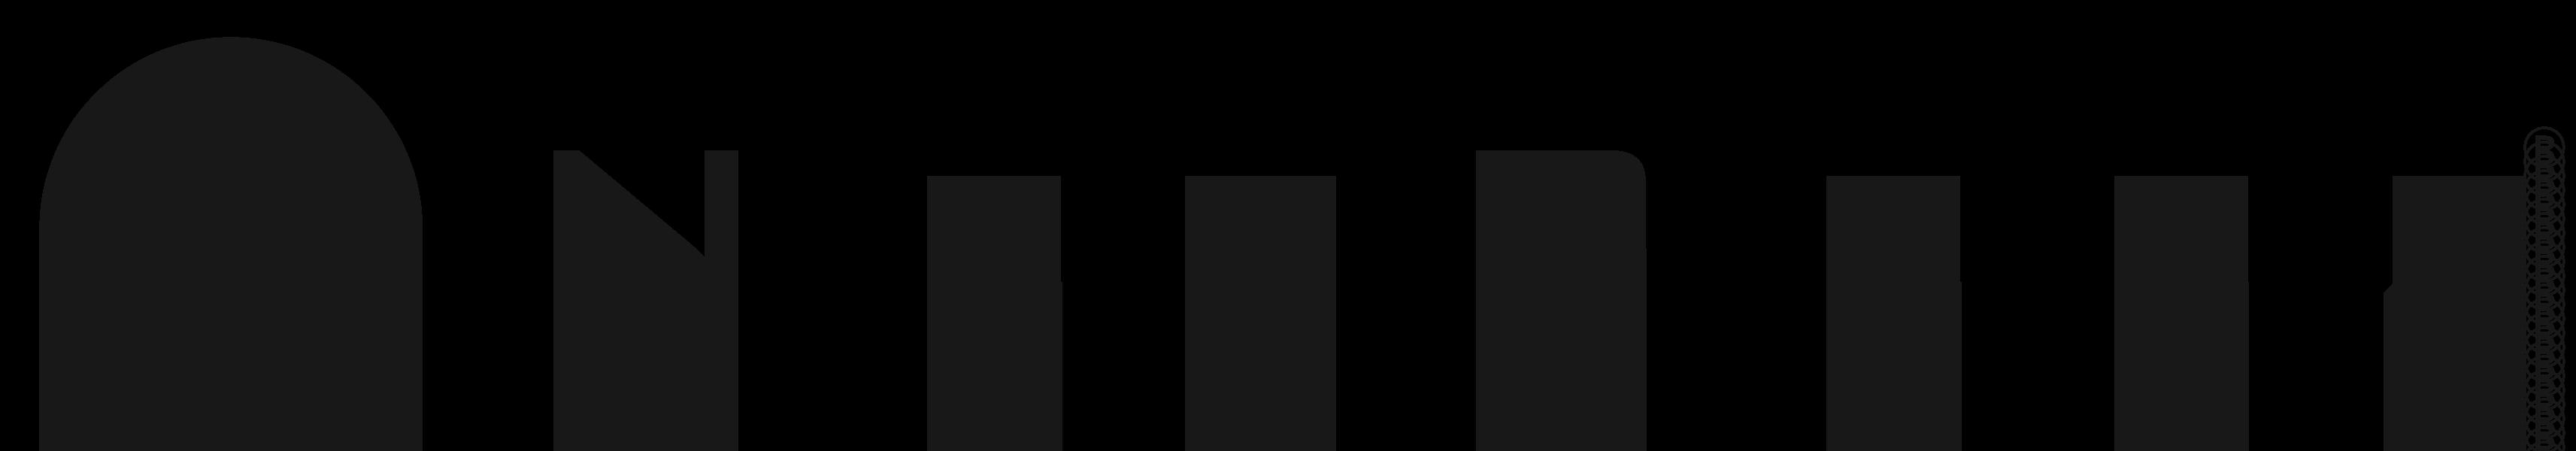 NB_logo_wordmark_final_dark_reg_trademark-01.png